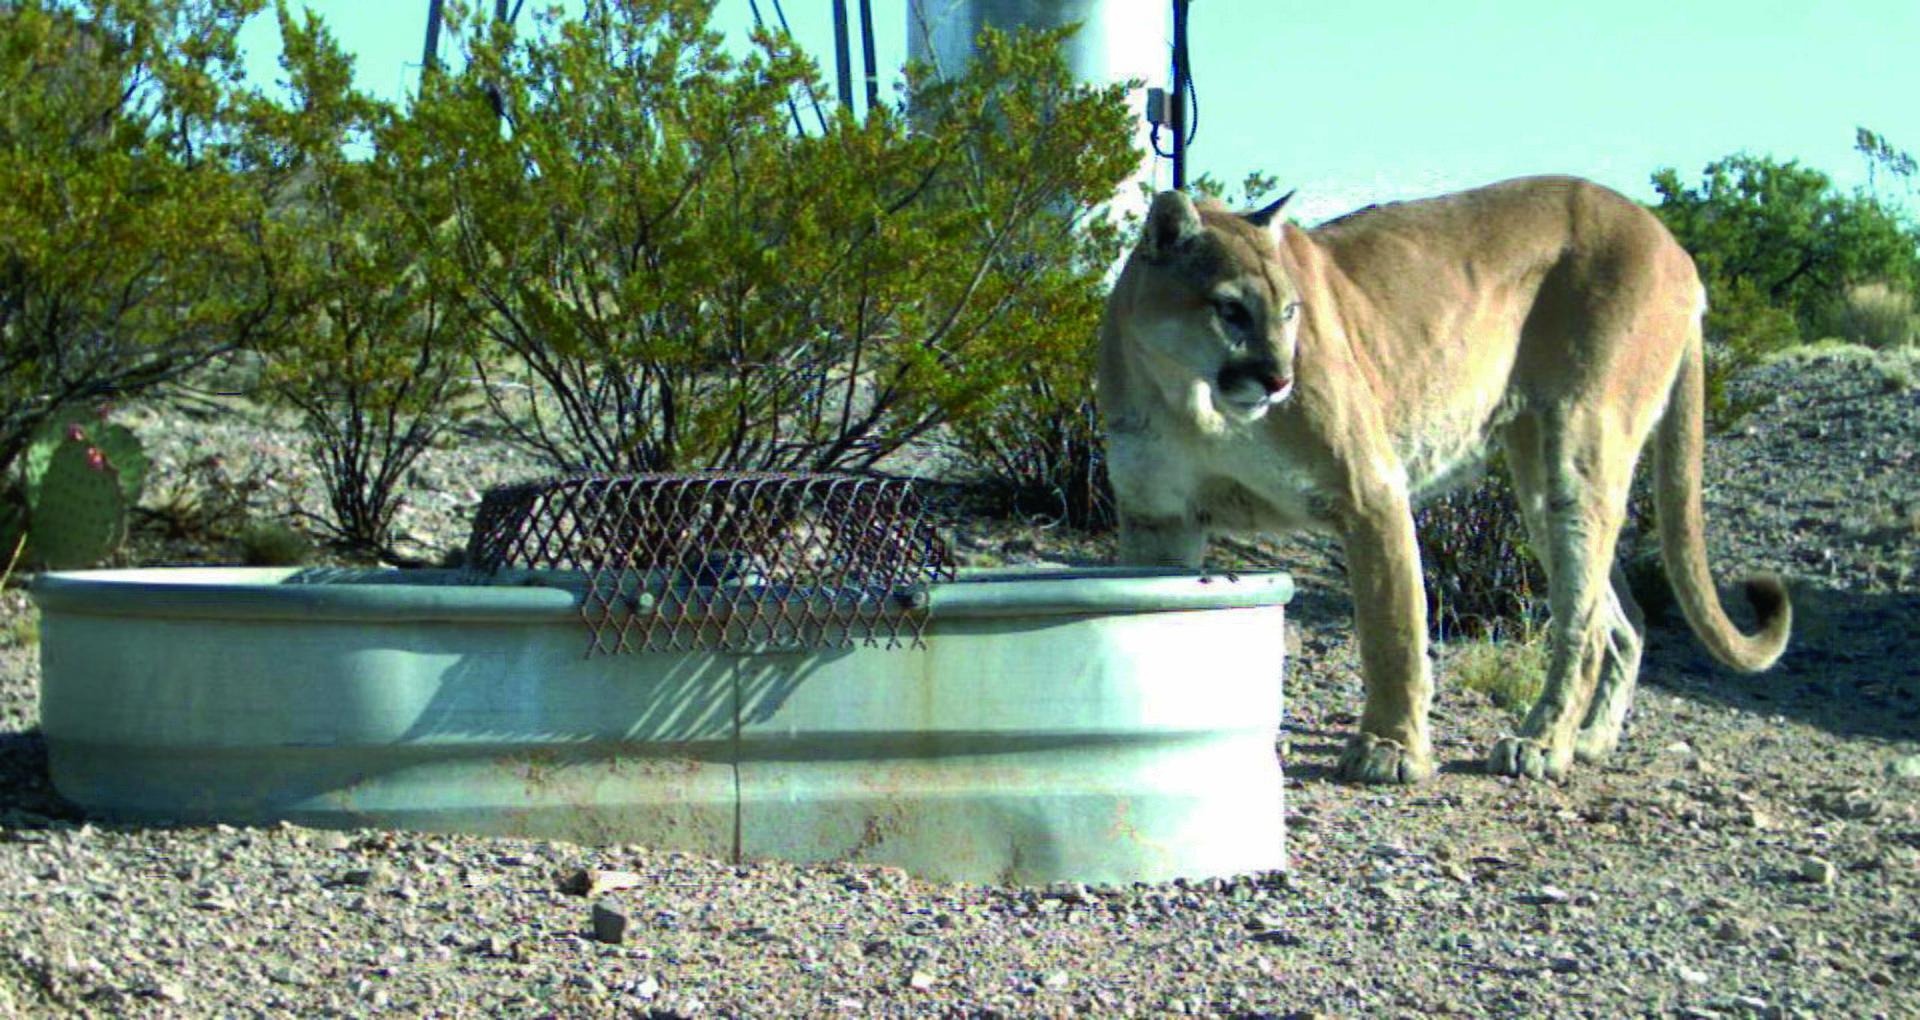 Mountain lion cougar animal in urban area puma concolor.jpg